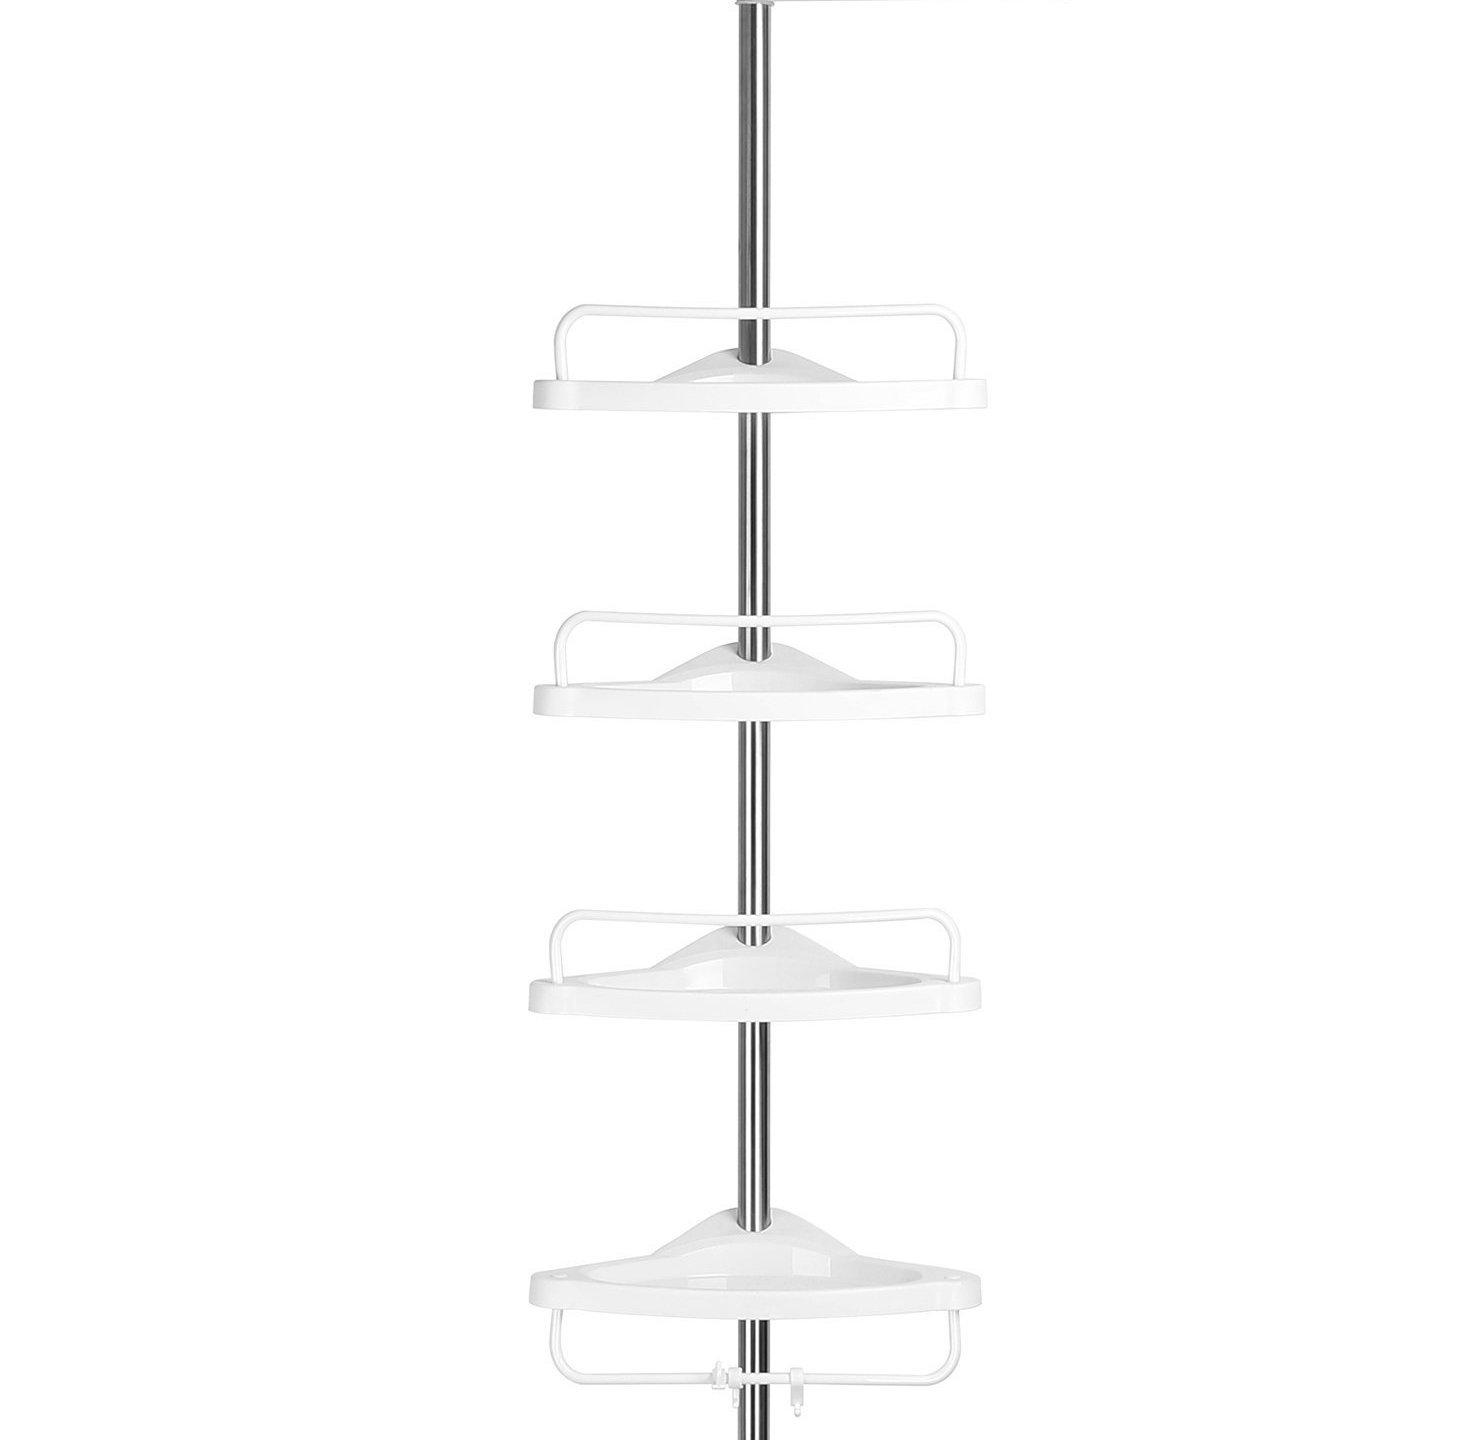 plastic corner shower caddy constant tension pole with adjustable plastic corner shower caddy